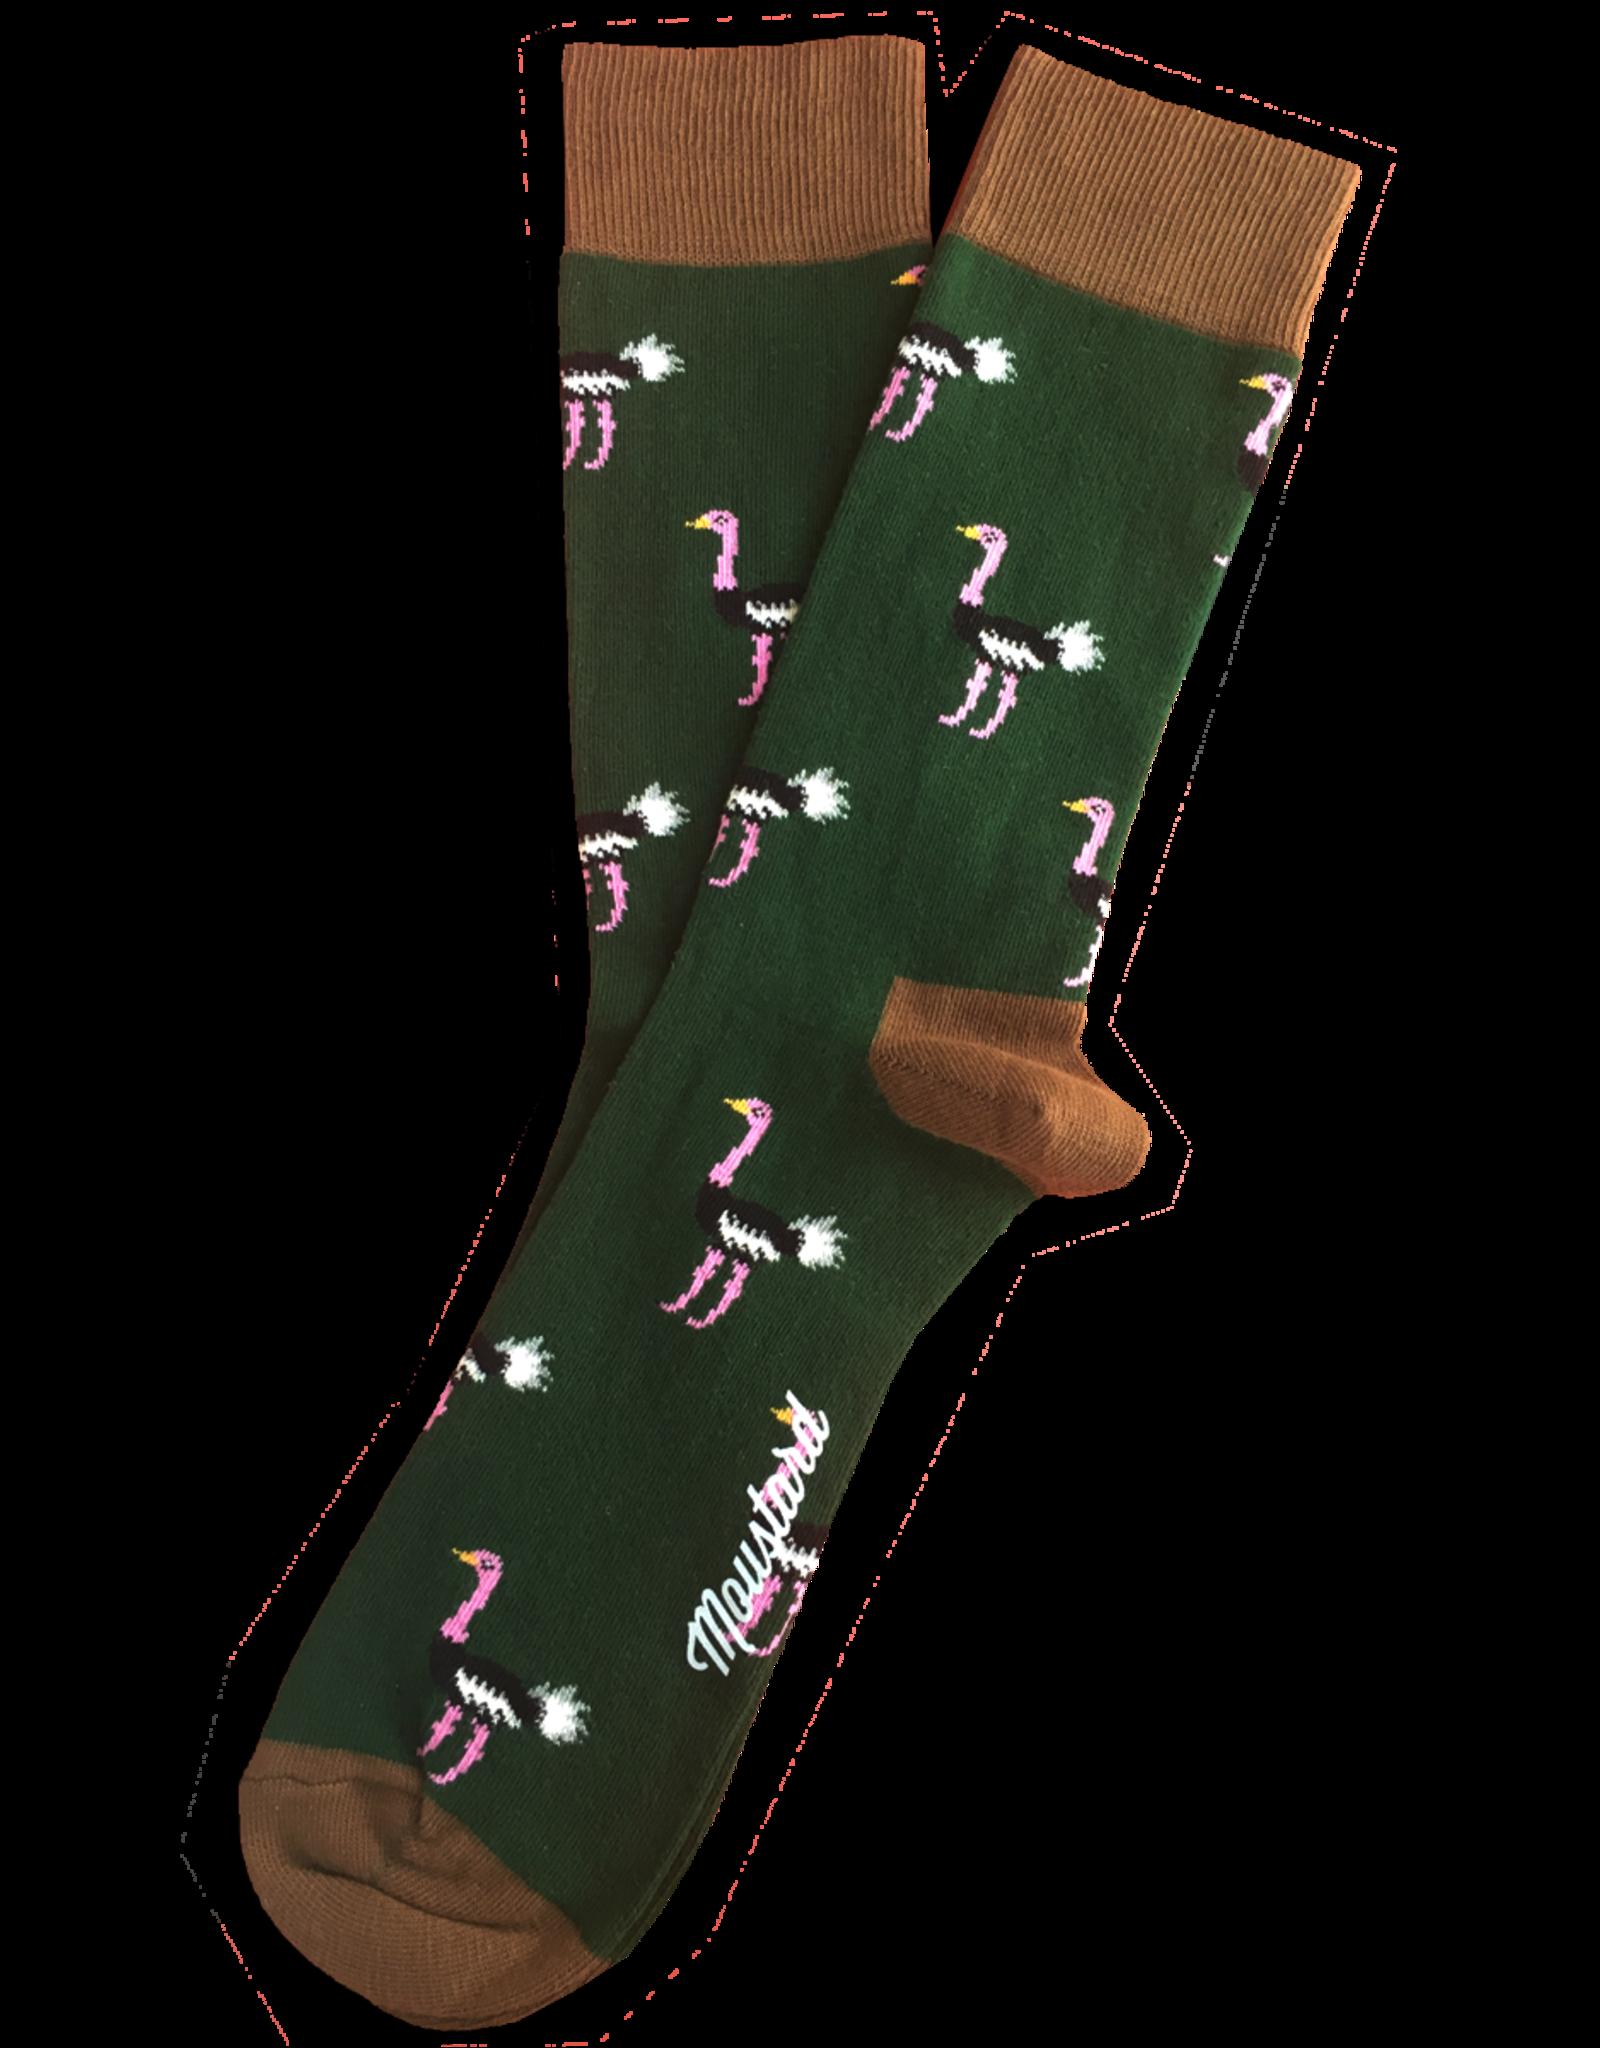 Moustard socks - ostrichs (41-46)